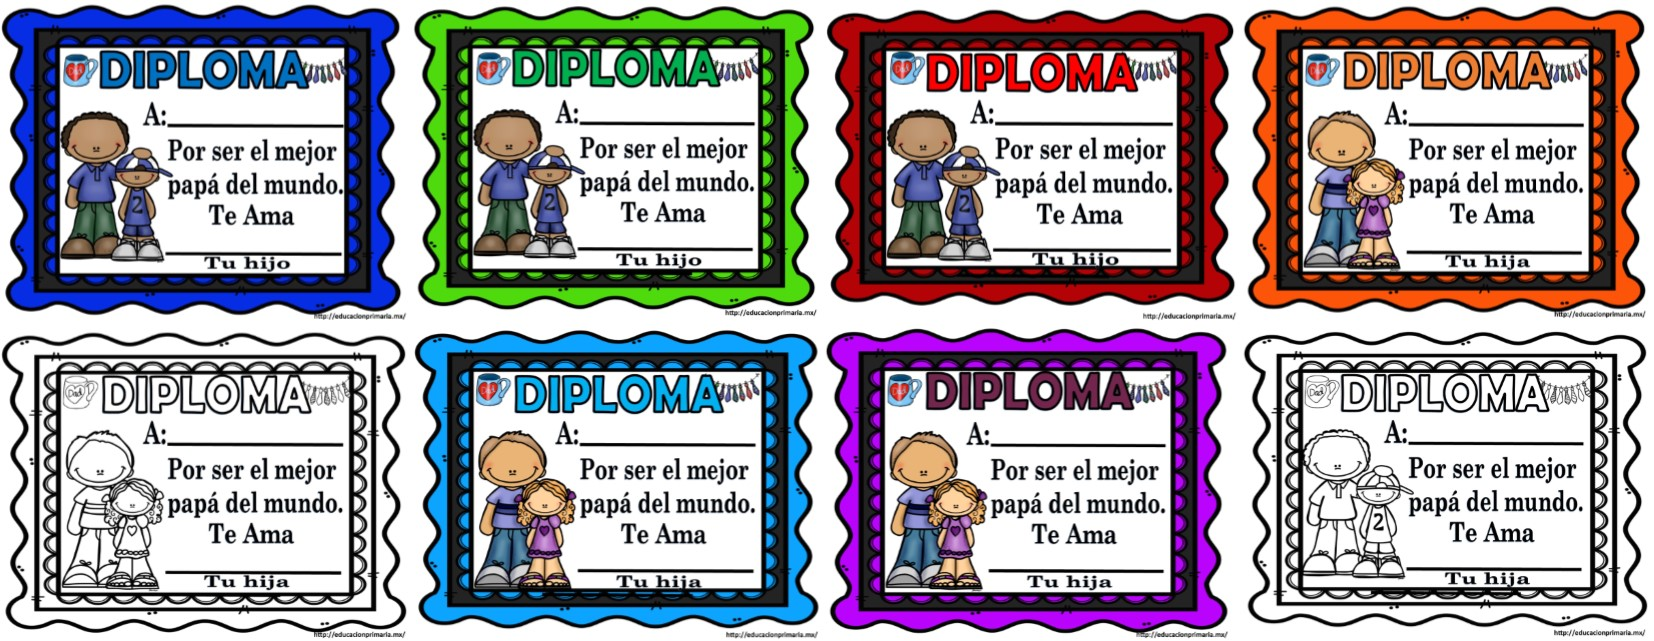 Estupendos diplomas para el da del padre  Material Educativo